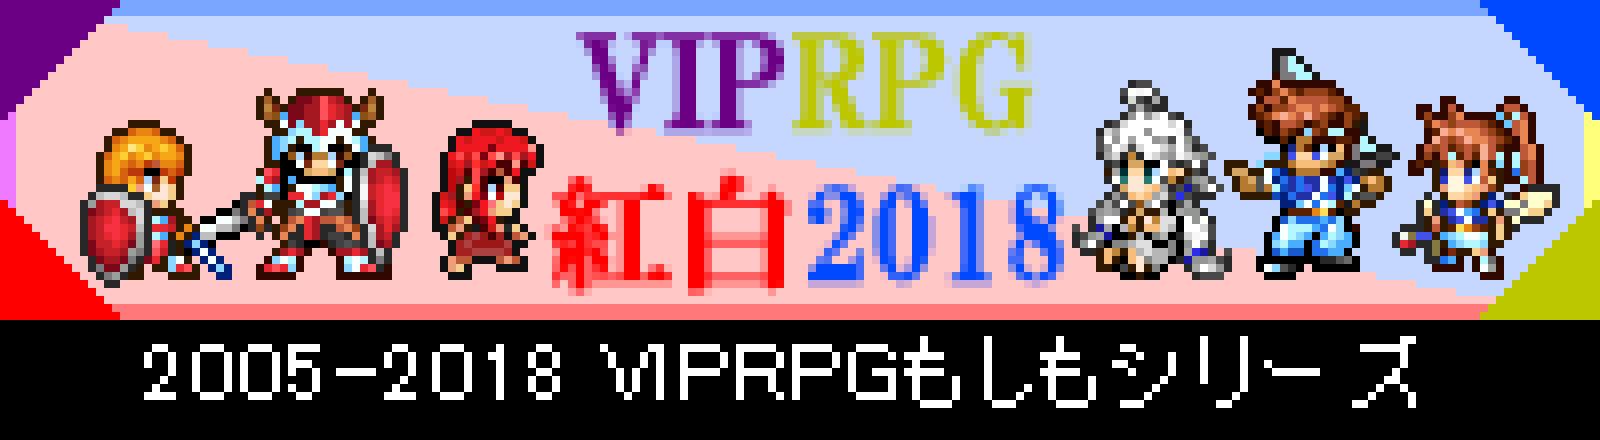 Notatki gaijina #1 – Przegląd VIPRPG Kohaku 2018